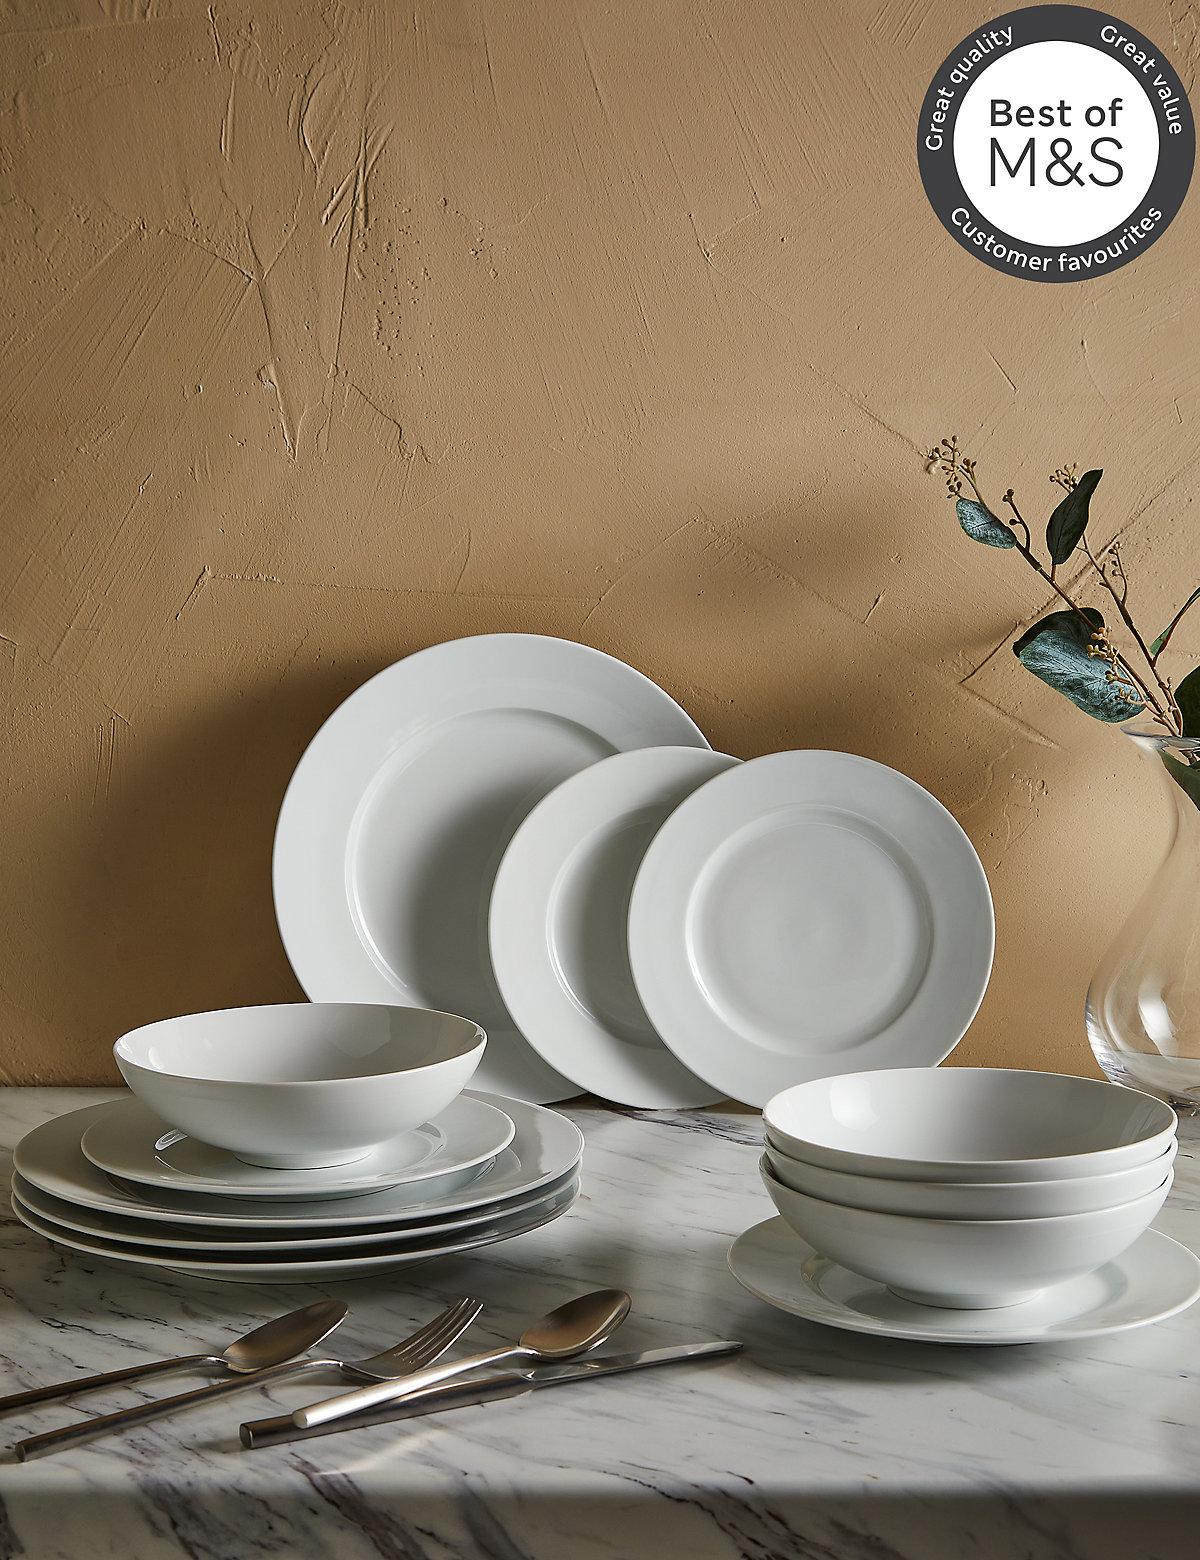 Image of 12 Piece Maxim Box Dinner Set